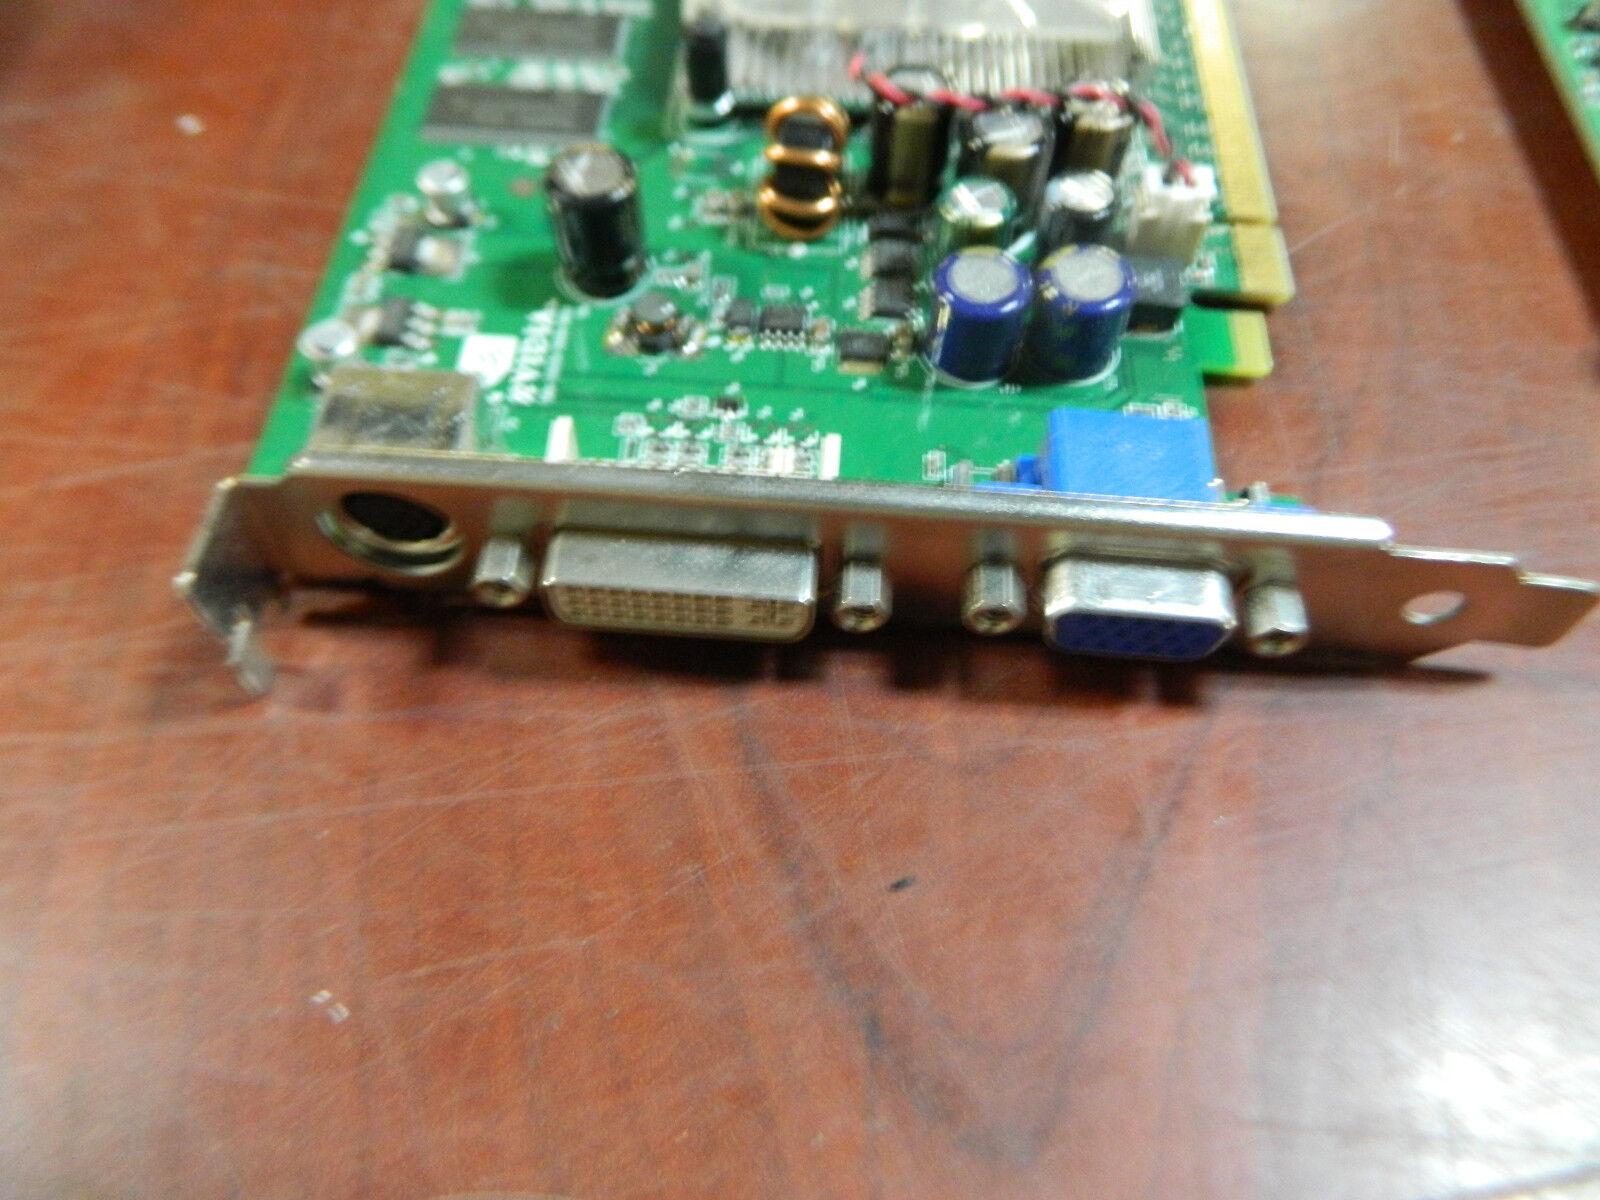 HP NVIDIA QUADRO FX 540 PCI-EXPRESS 365889-001 374358-001 Video Card - $50.00